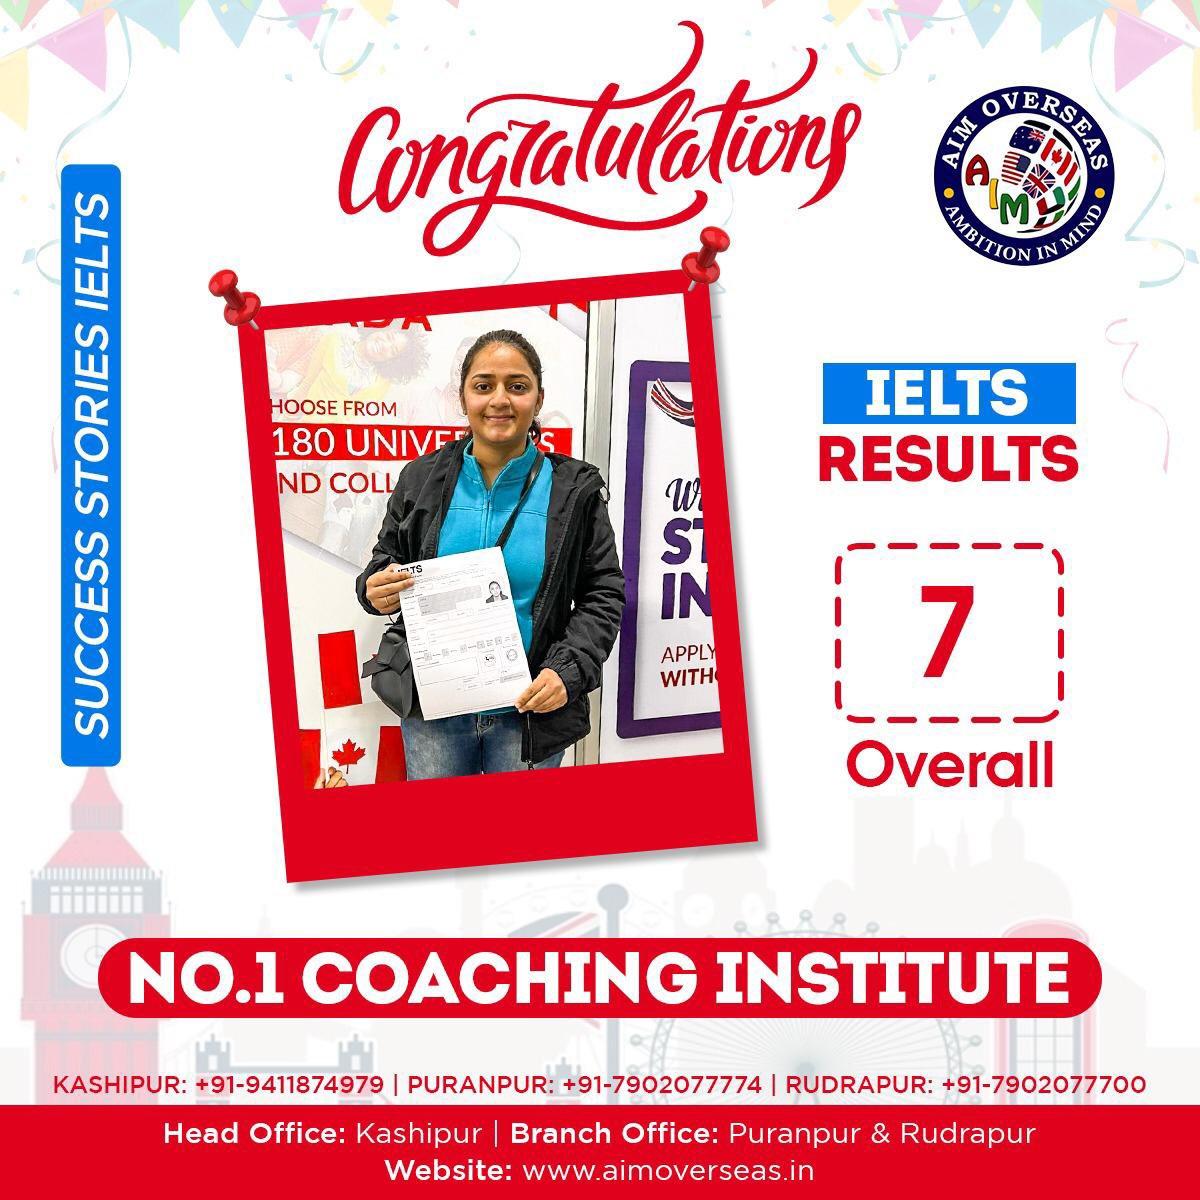 #aimoverseas #ilets #education #MotivationalQuotes #Essay #Congratulations #success #thursdaymorning #ThursdayThoughts #Thursday